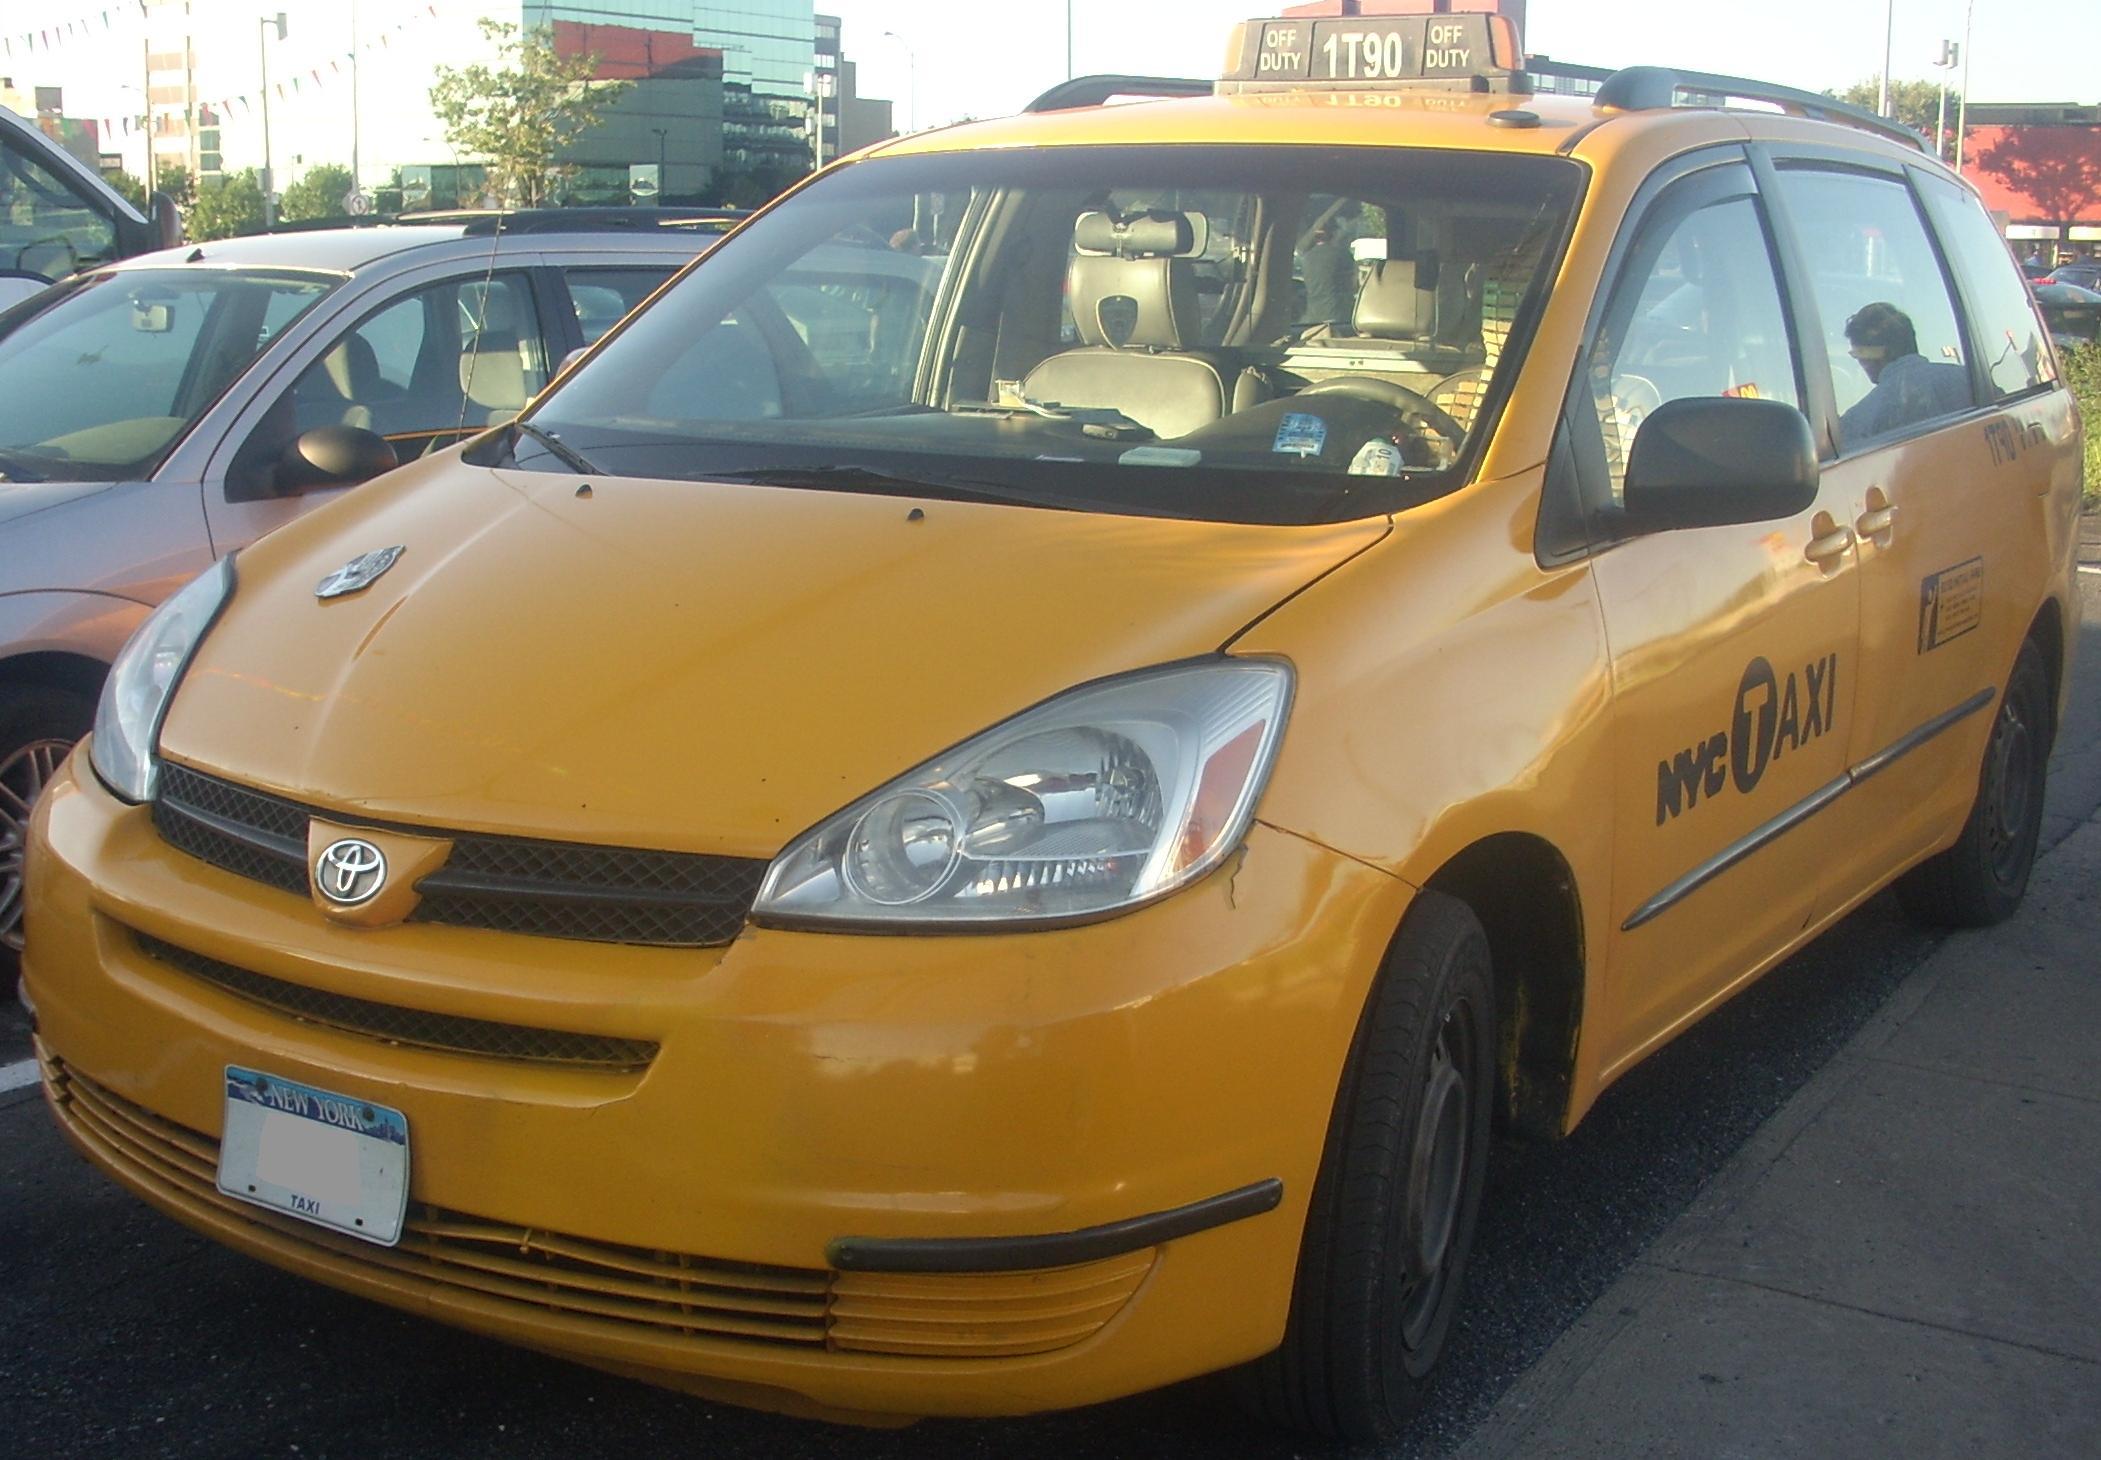 Toyota Of Orange >> File:'04-'05 Toyota Sienna NYC Taxi (Orange Julep).jpg - Wikimedia Commons